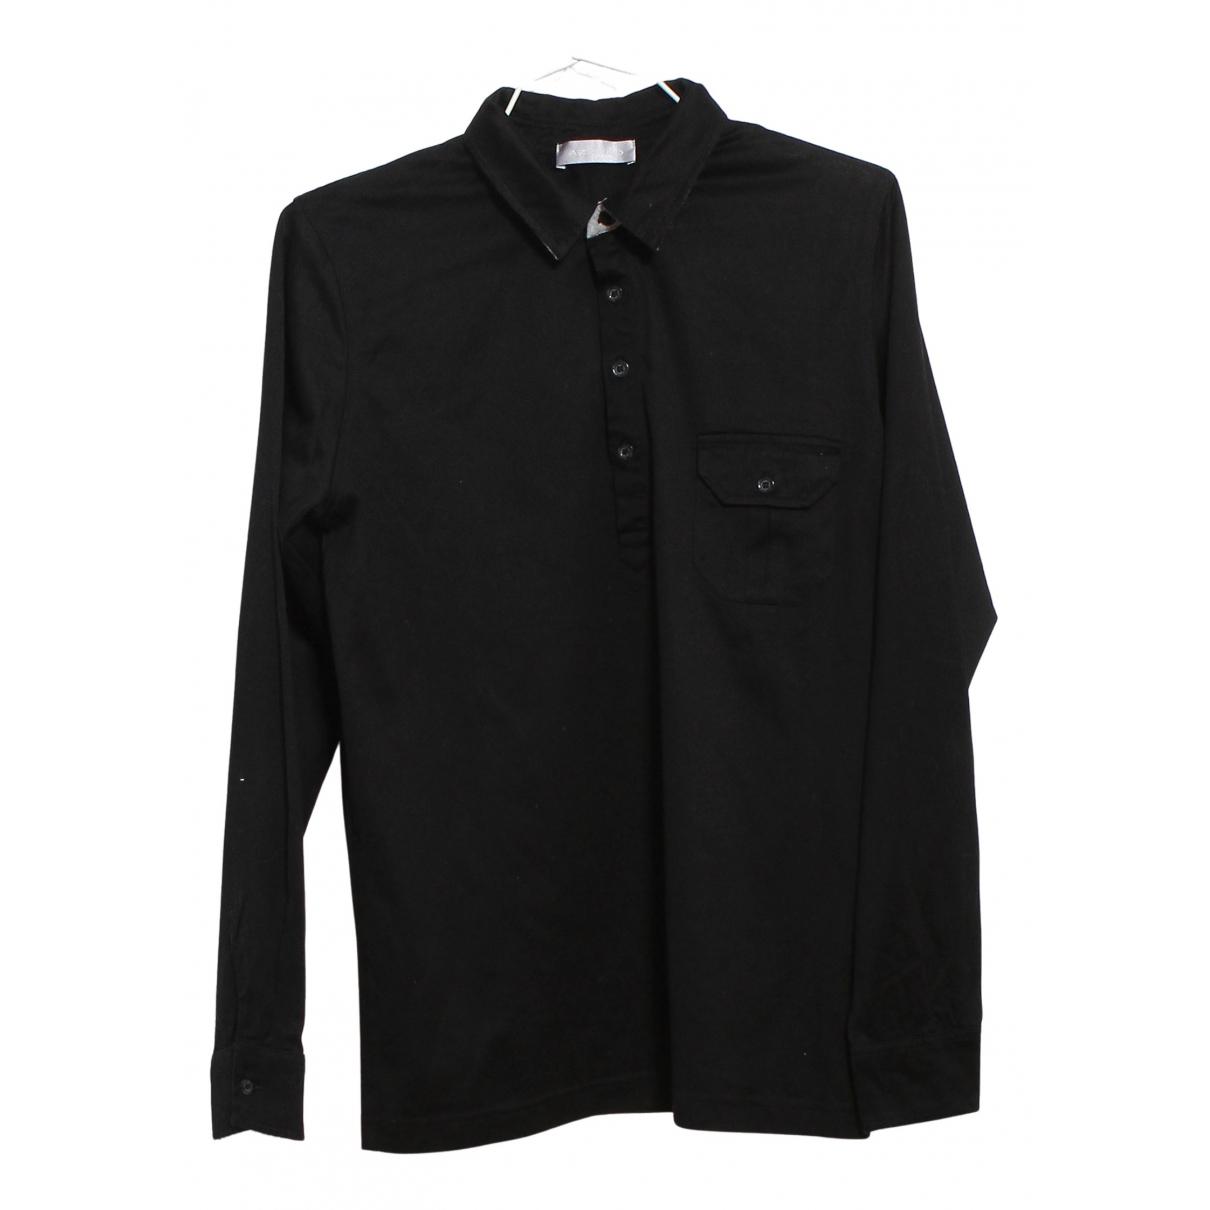 Azzaro N Black Cotton Polo shirts for Men M International